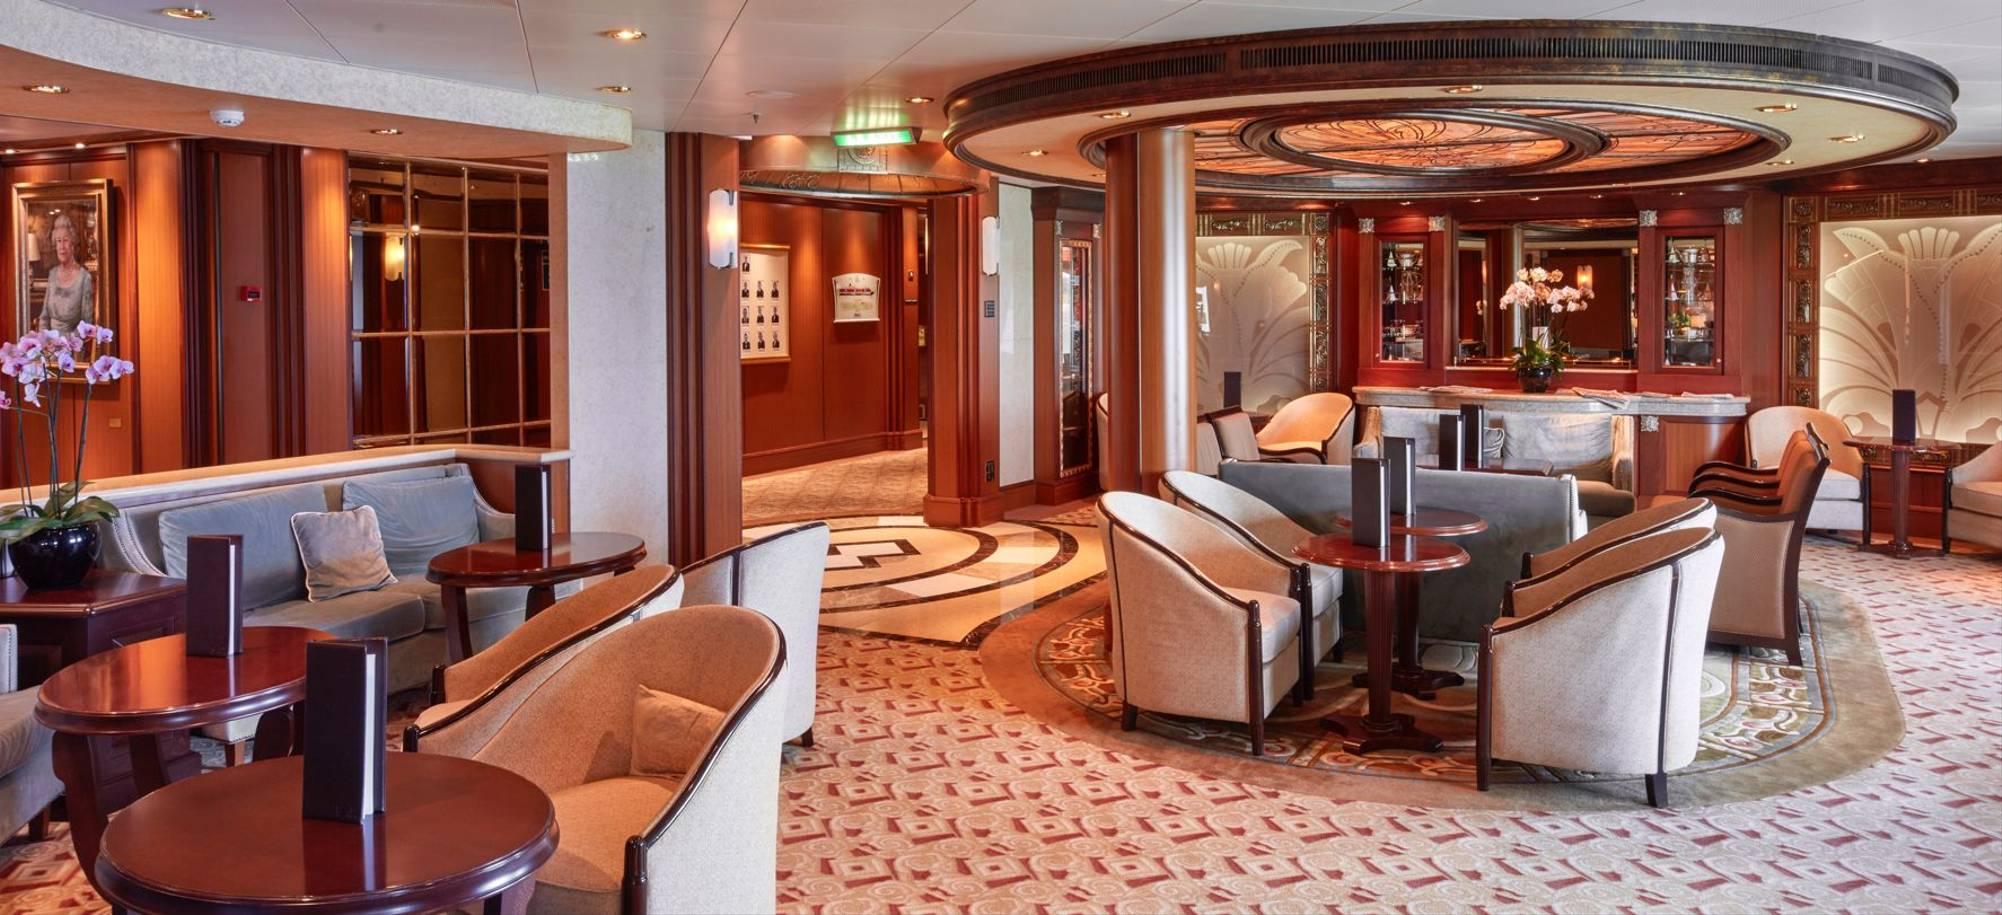 7 Day   At Sea, Cafe Carinthia    Itinerary Desktop